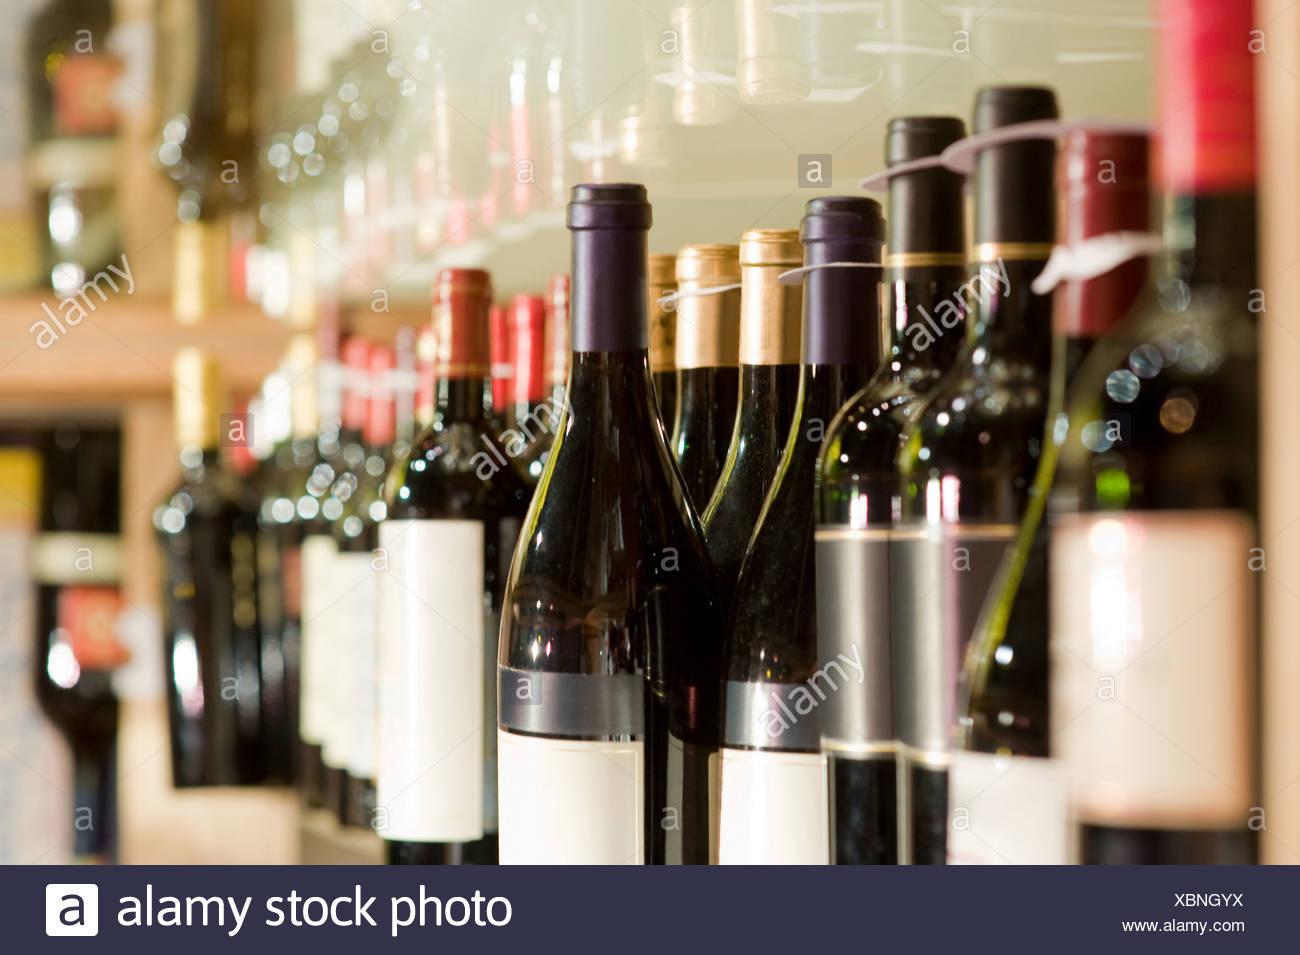 A selection of wine bottles on a shelf - Stock Image